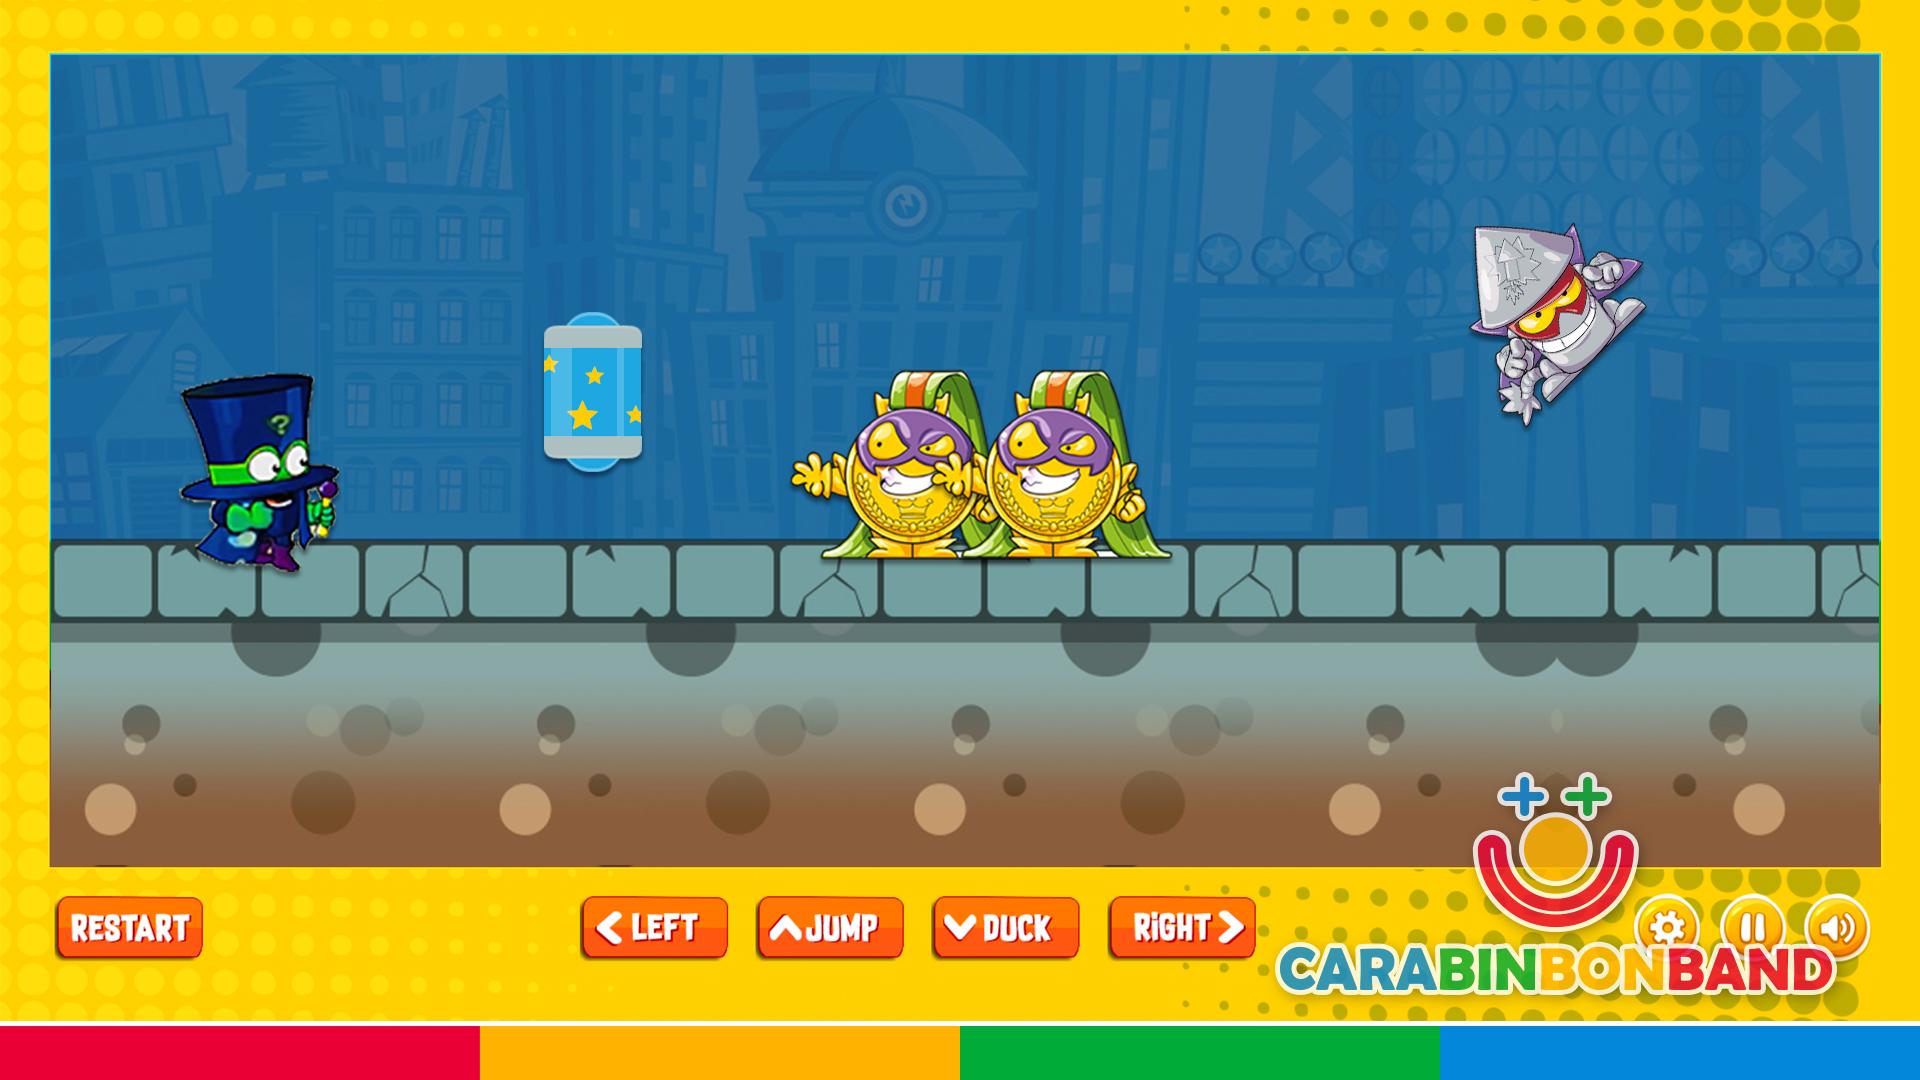 Videojuegos Superzings video games - Super zings apps